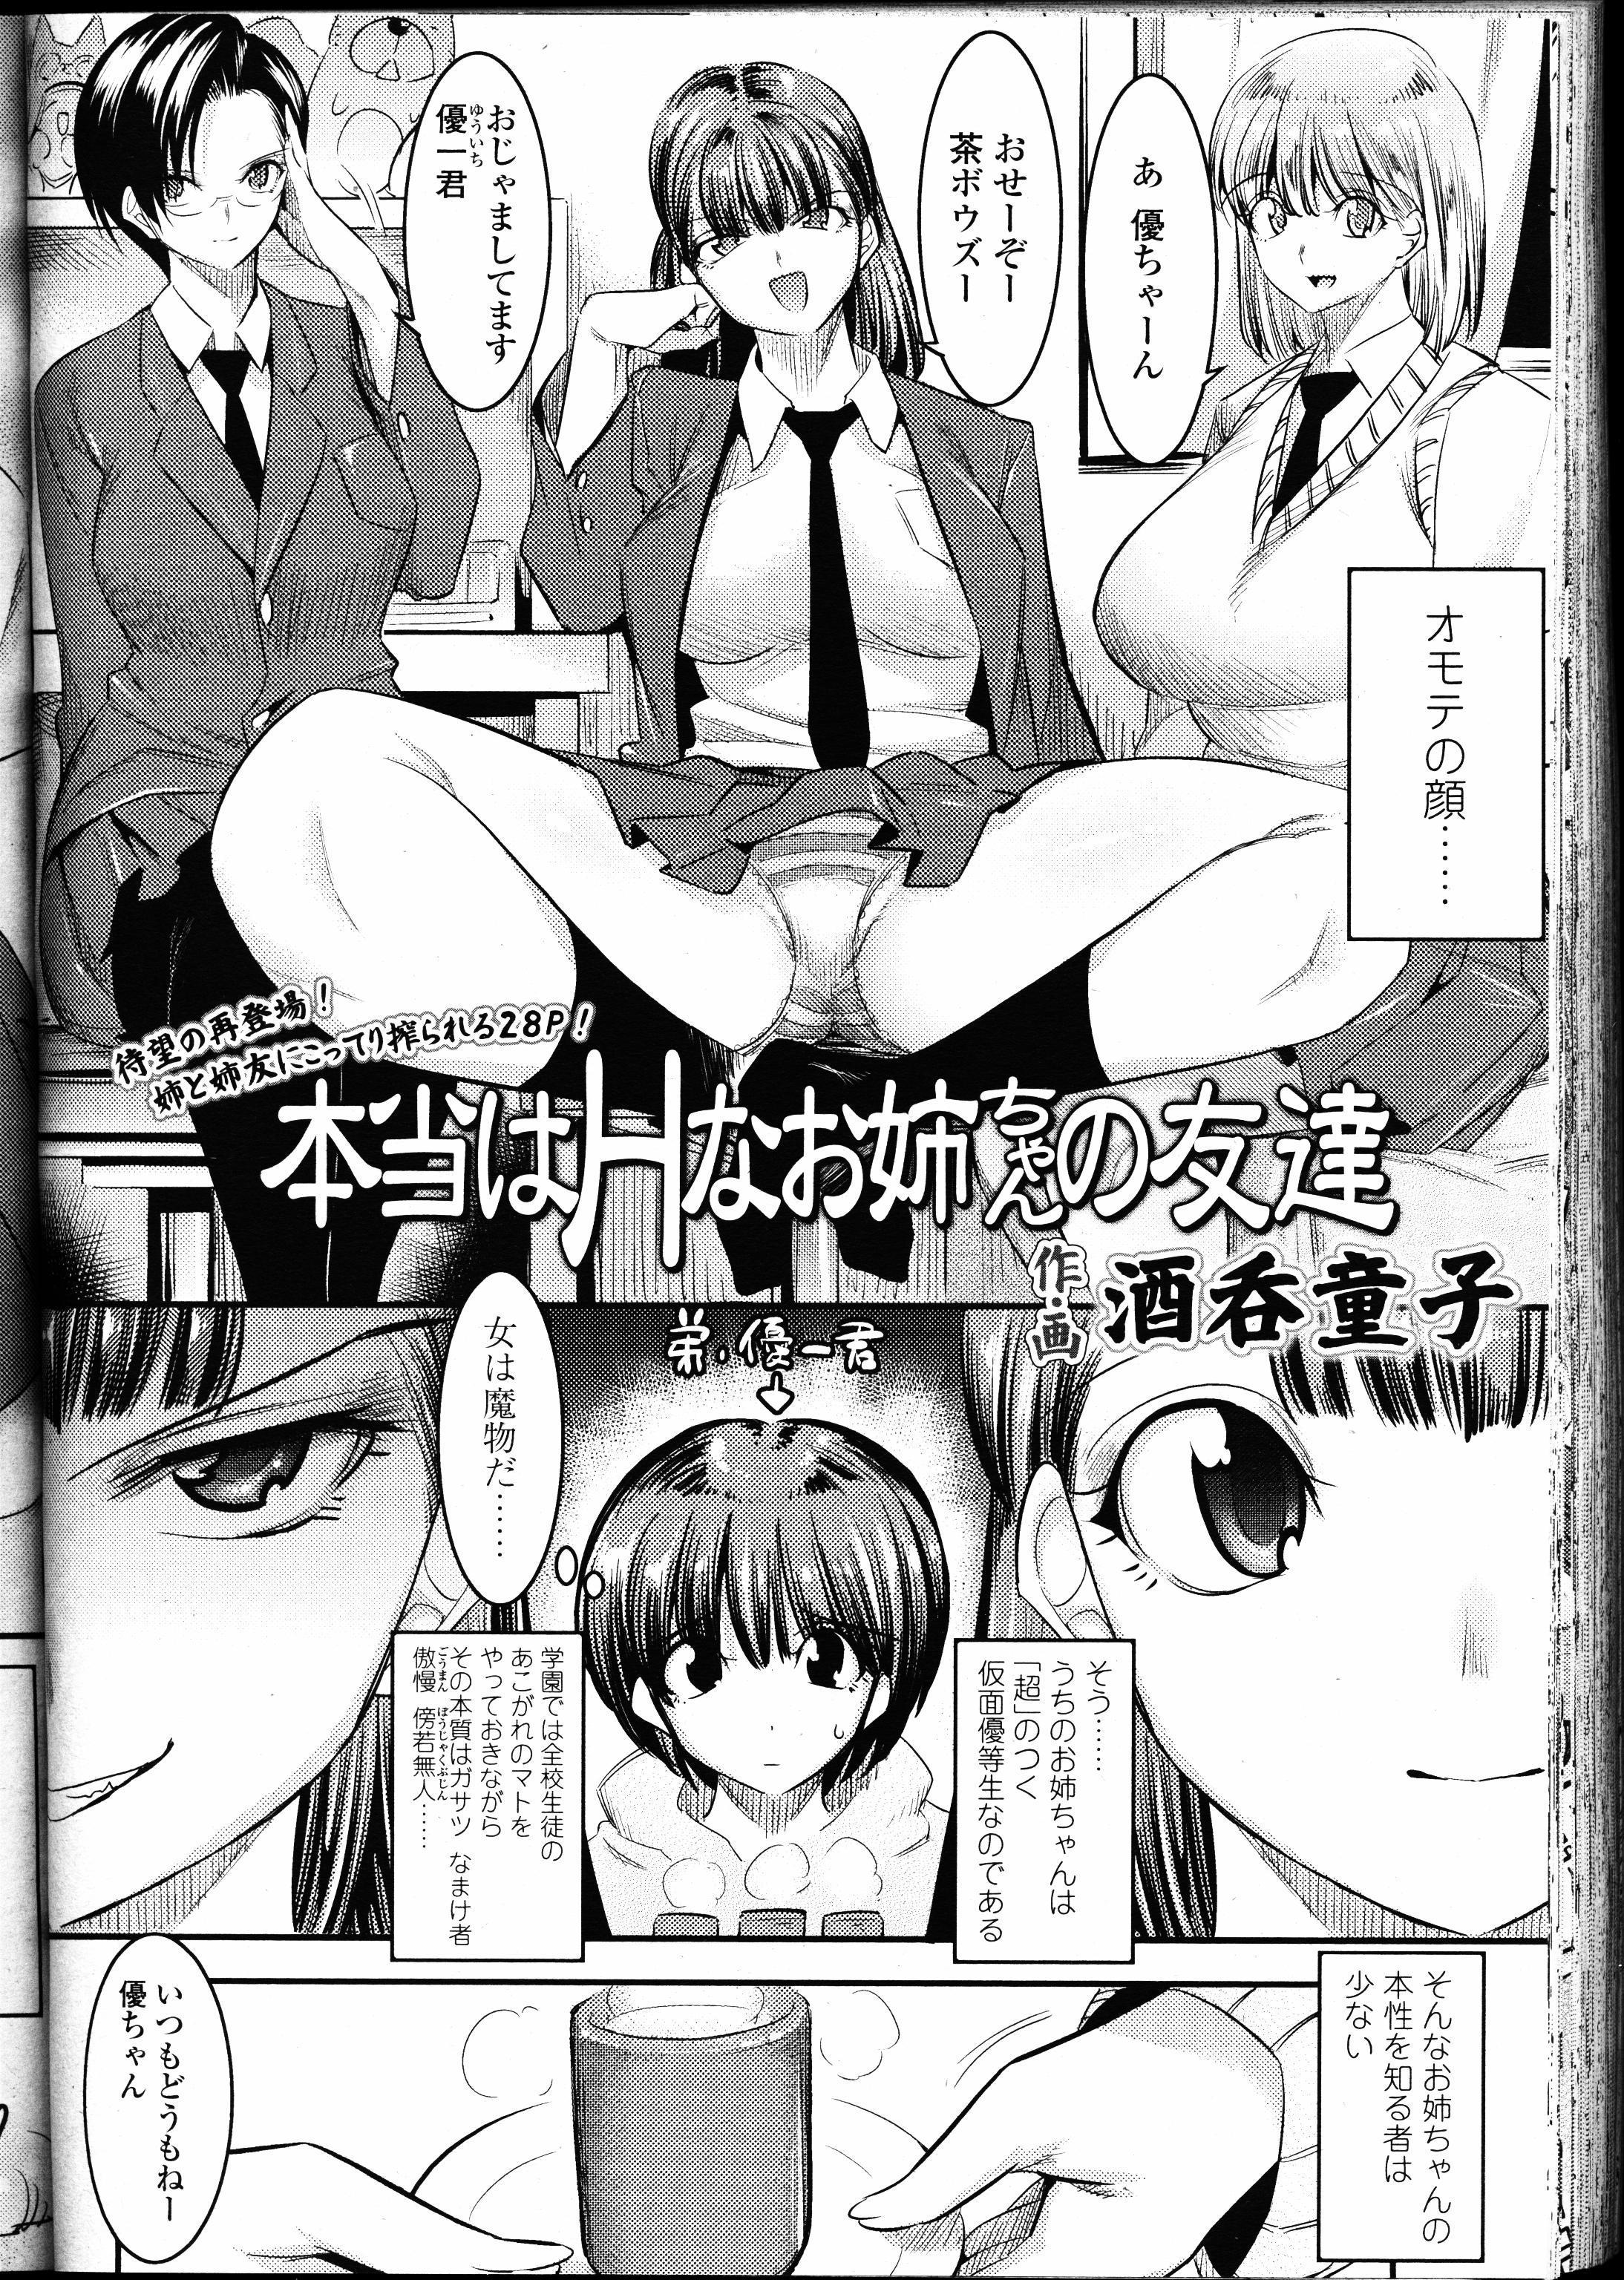 Girls forM Vol. 12 286